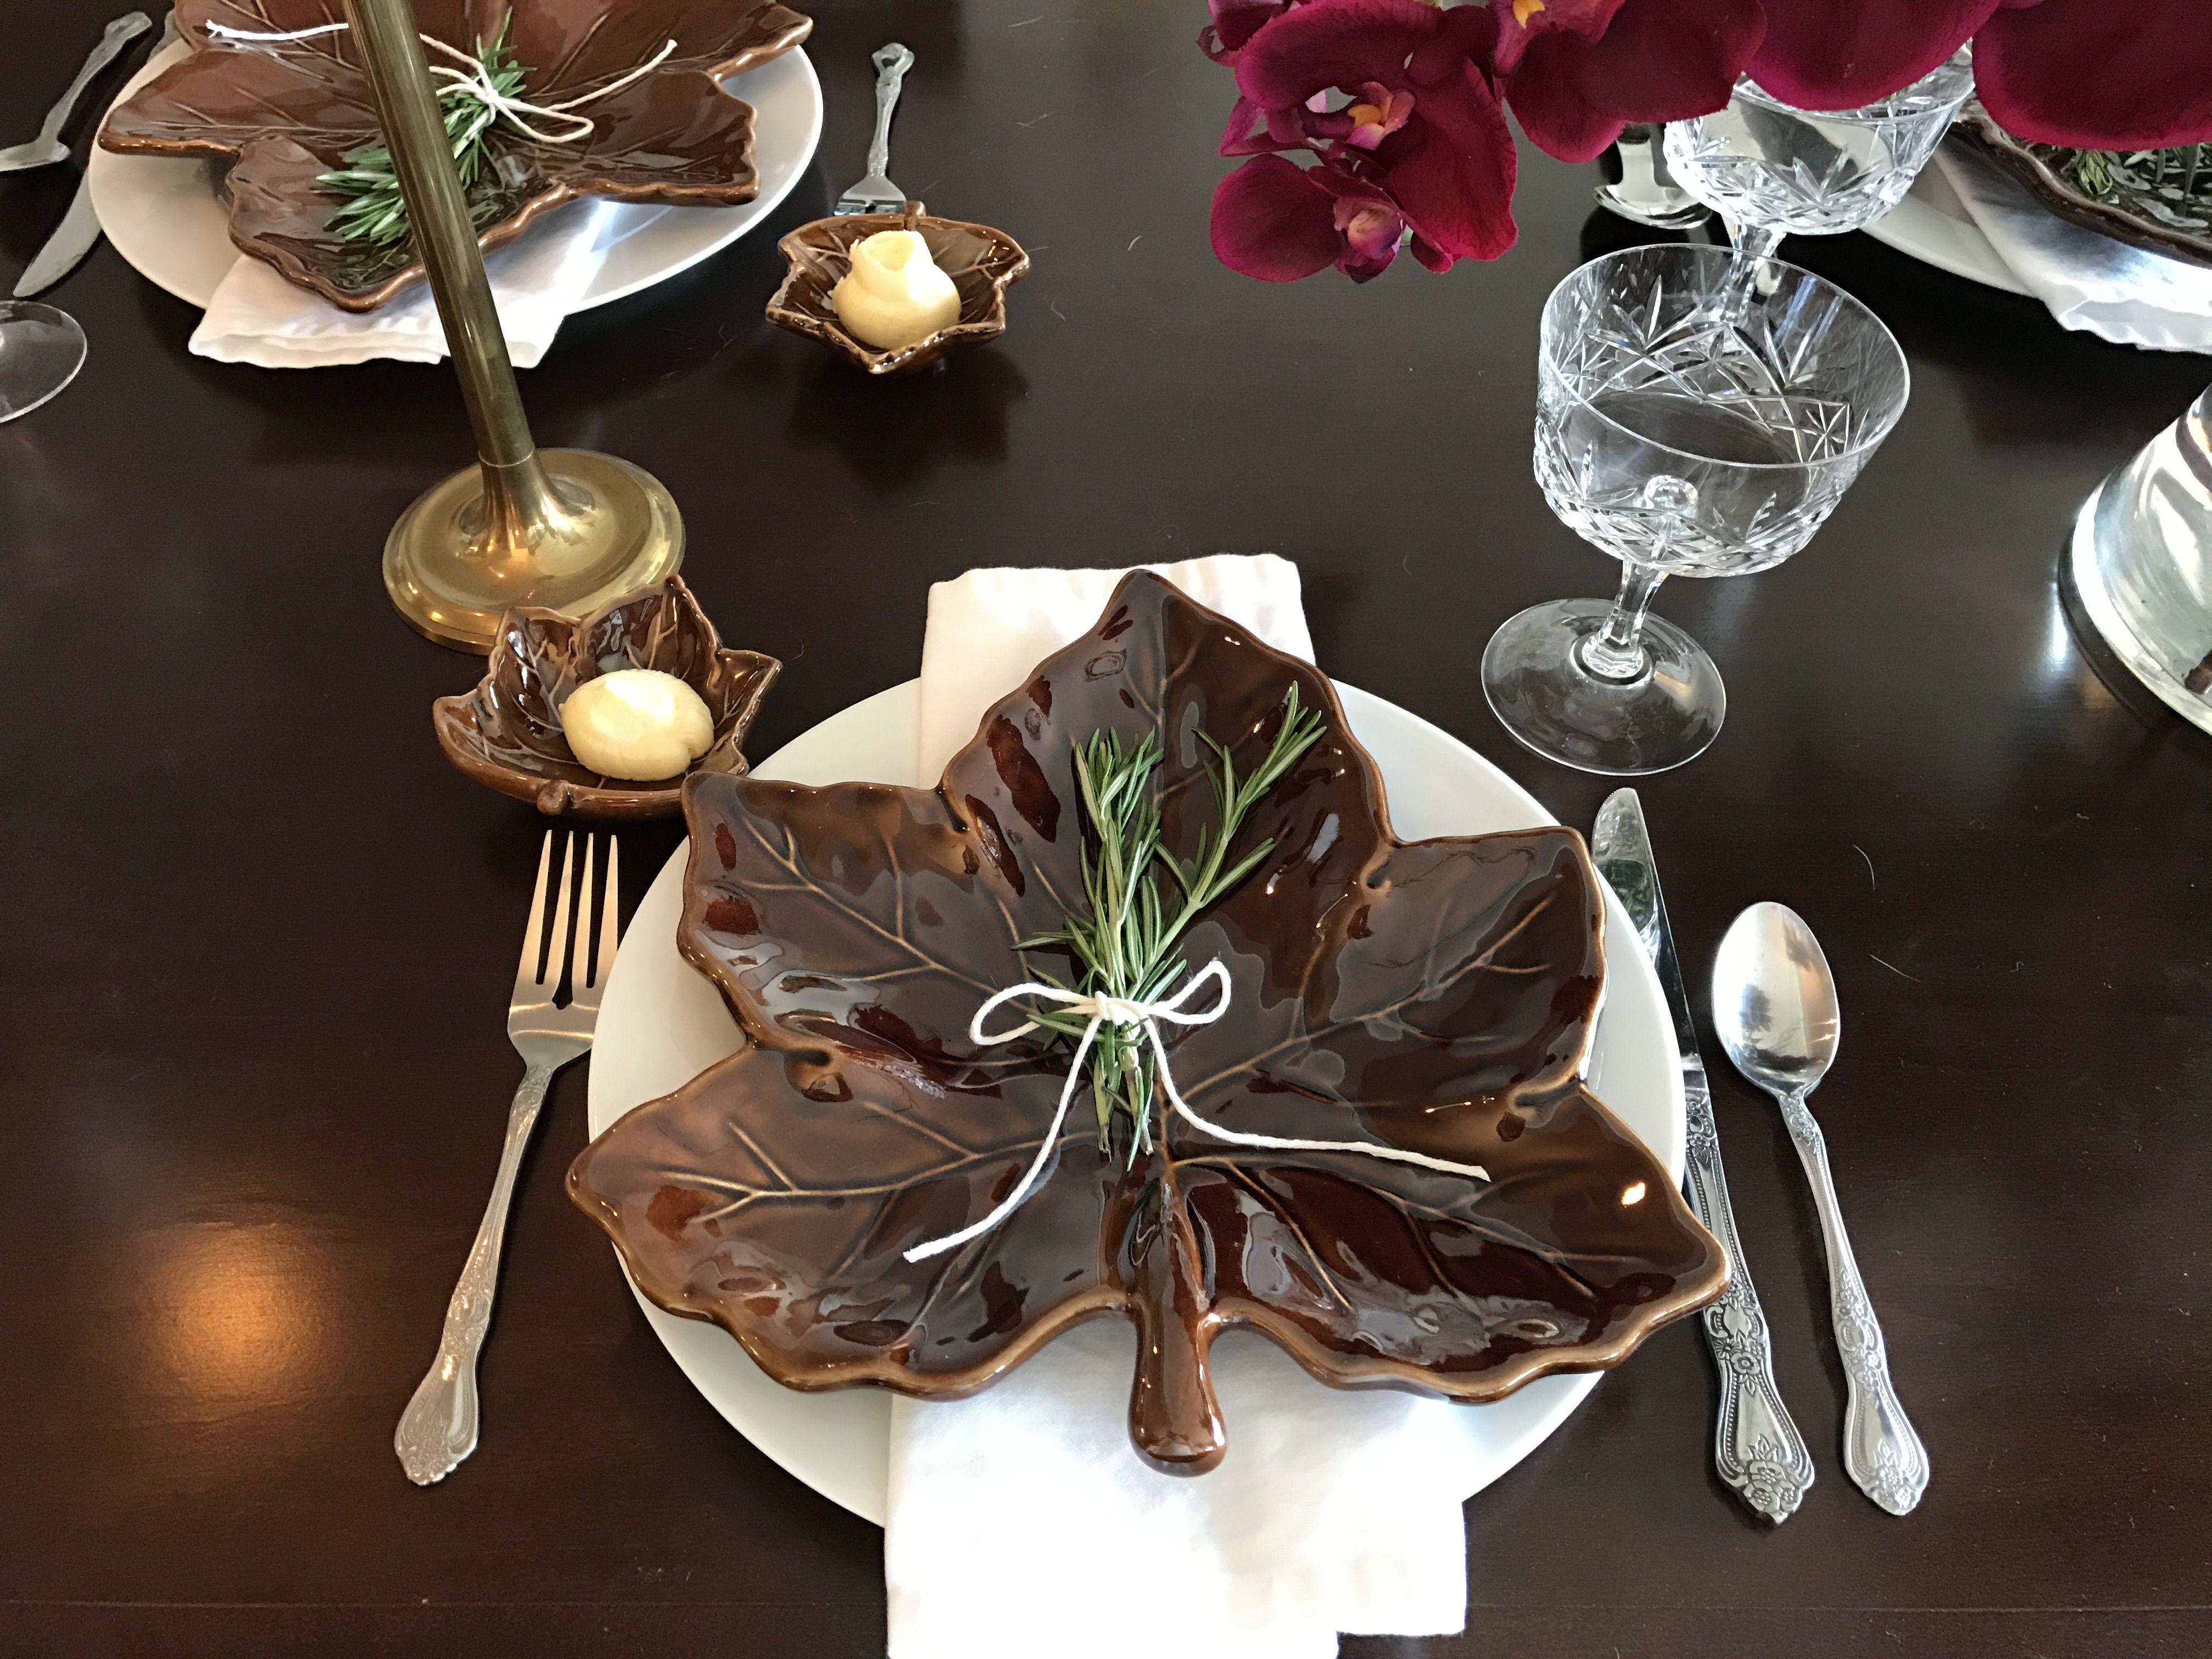 Thanksgiving table setting. Pottery Barn leaf plates, Williams Sonoma napkins, grandma's stemware & flatware. #thanksgiving #tablescape #placesetting